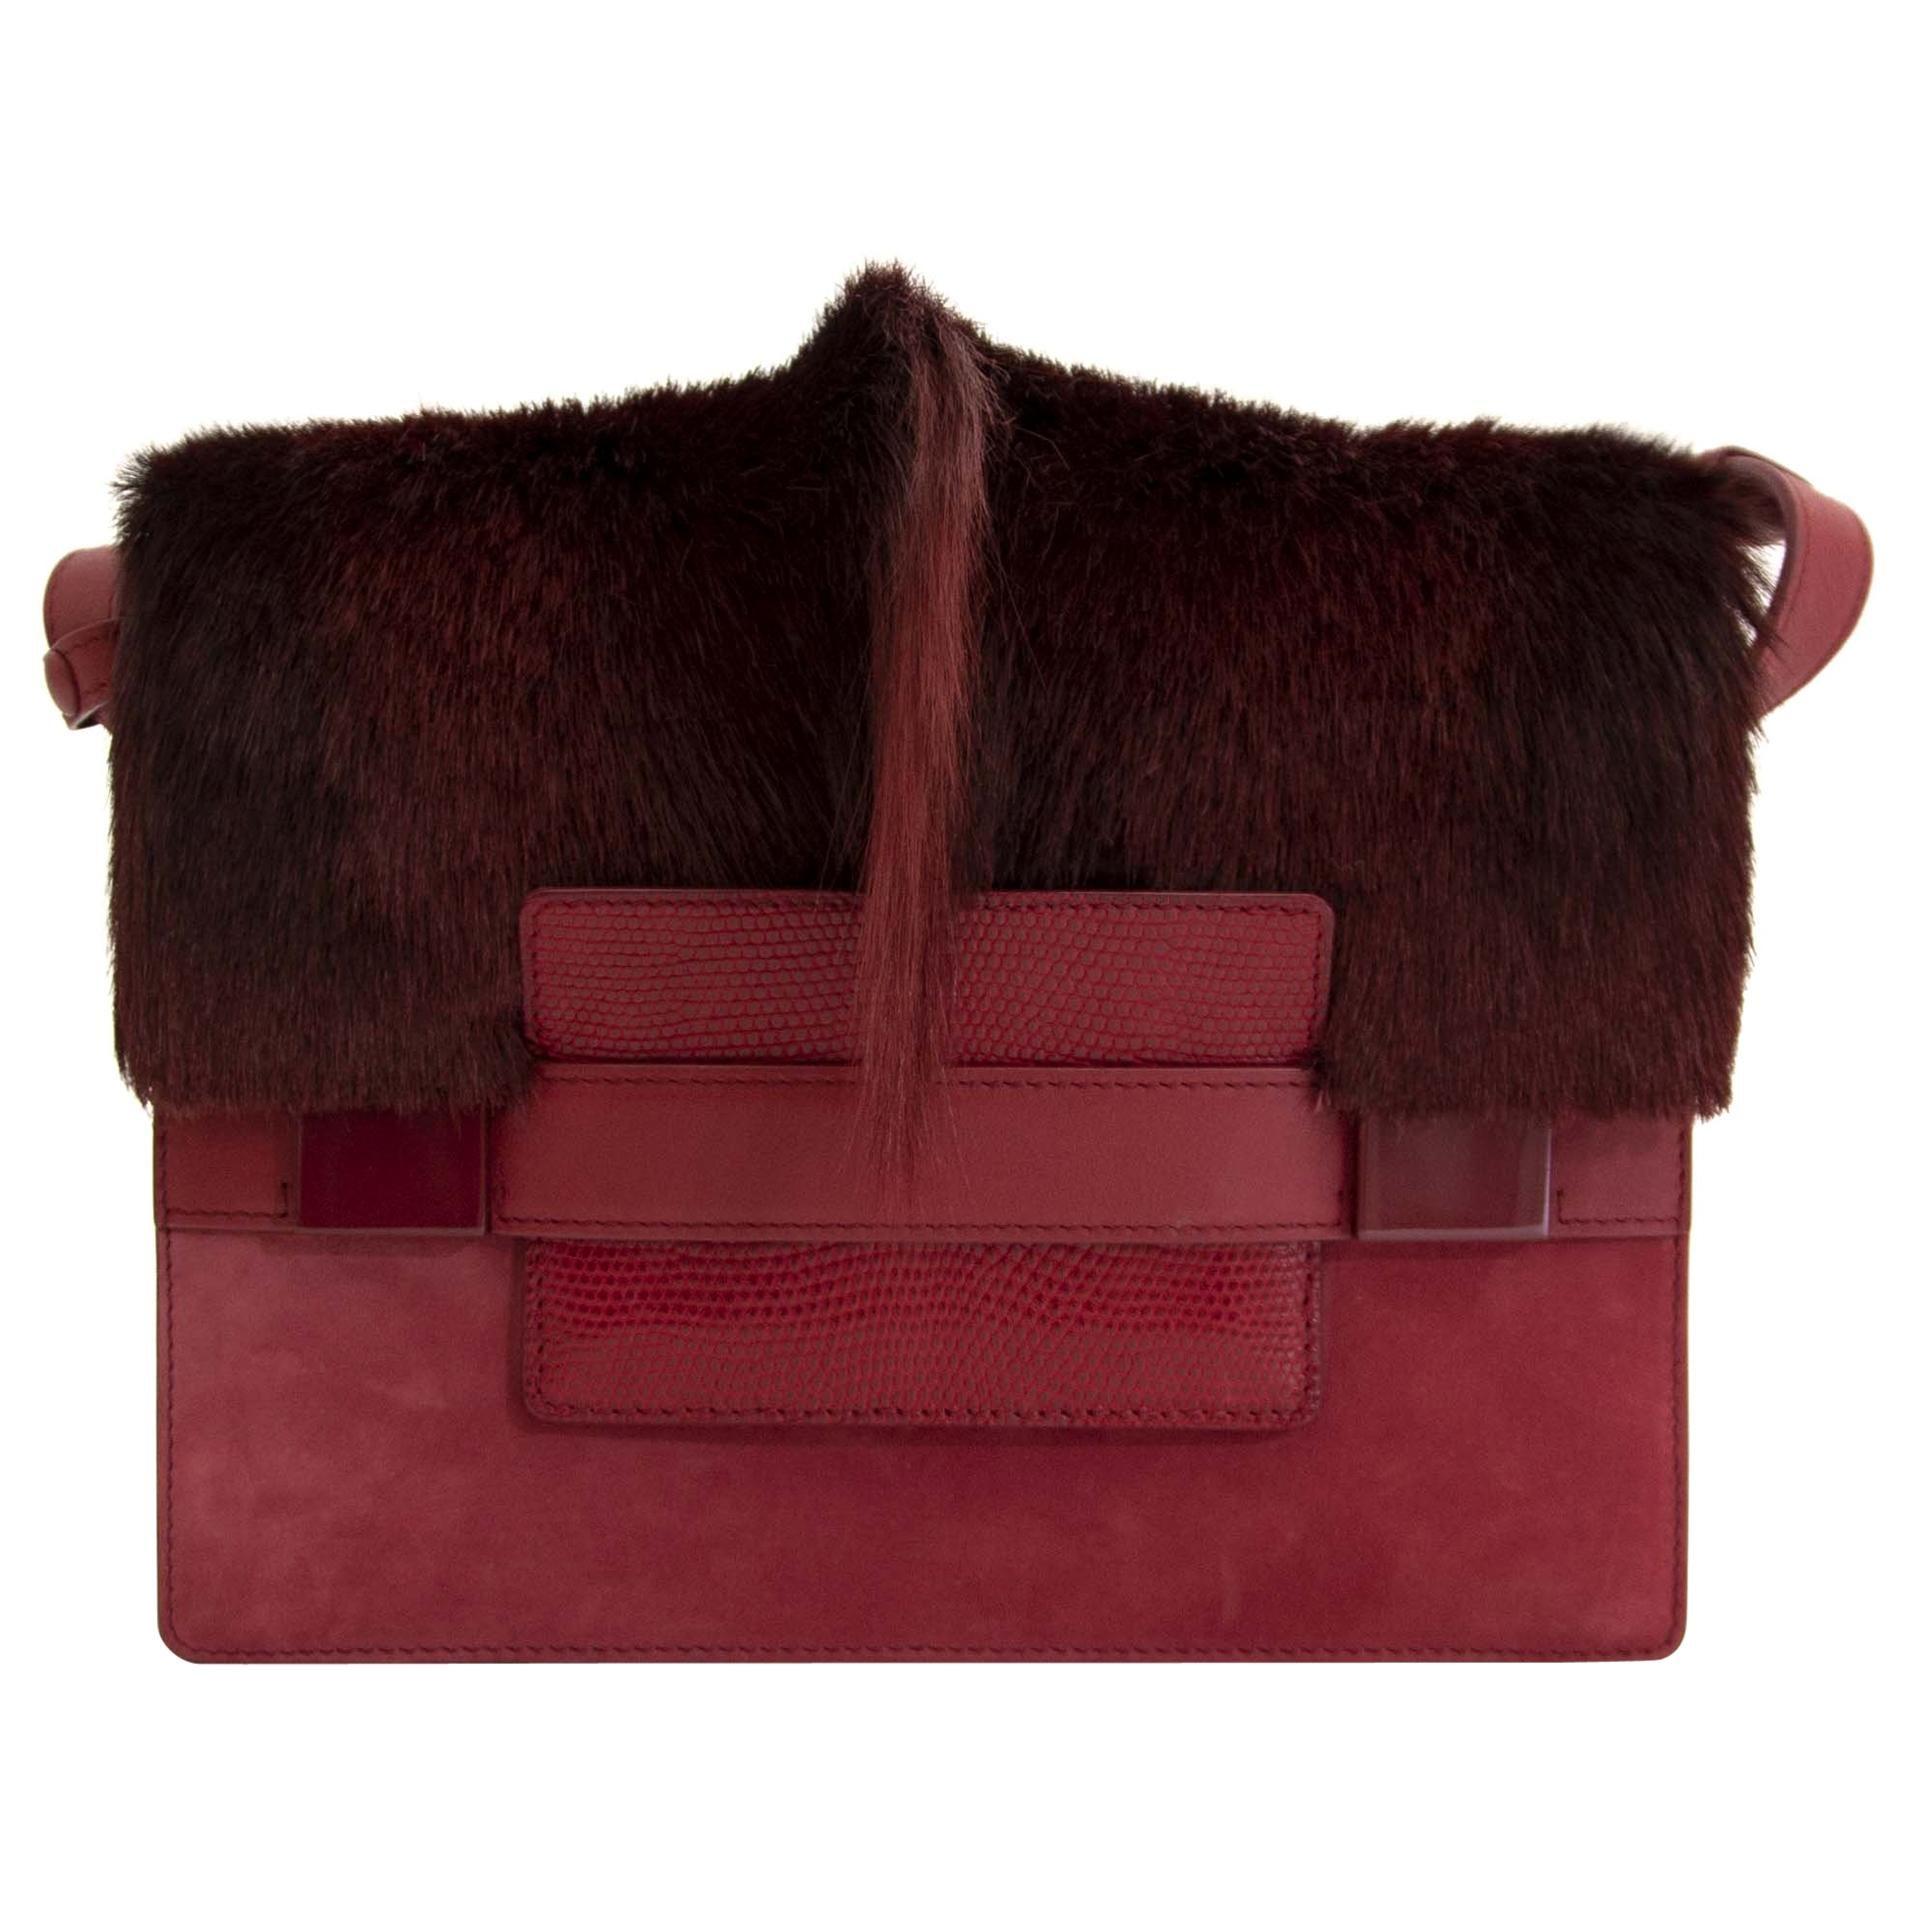 Delvaux Madame Springbok Crossbody Bag